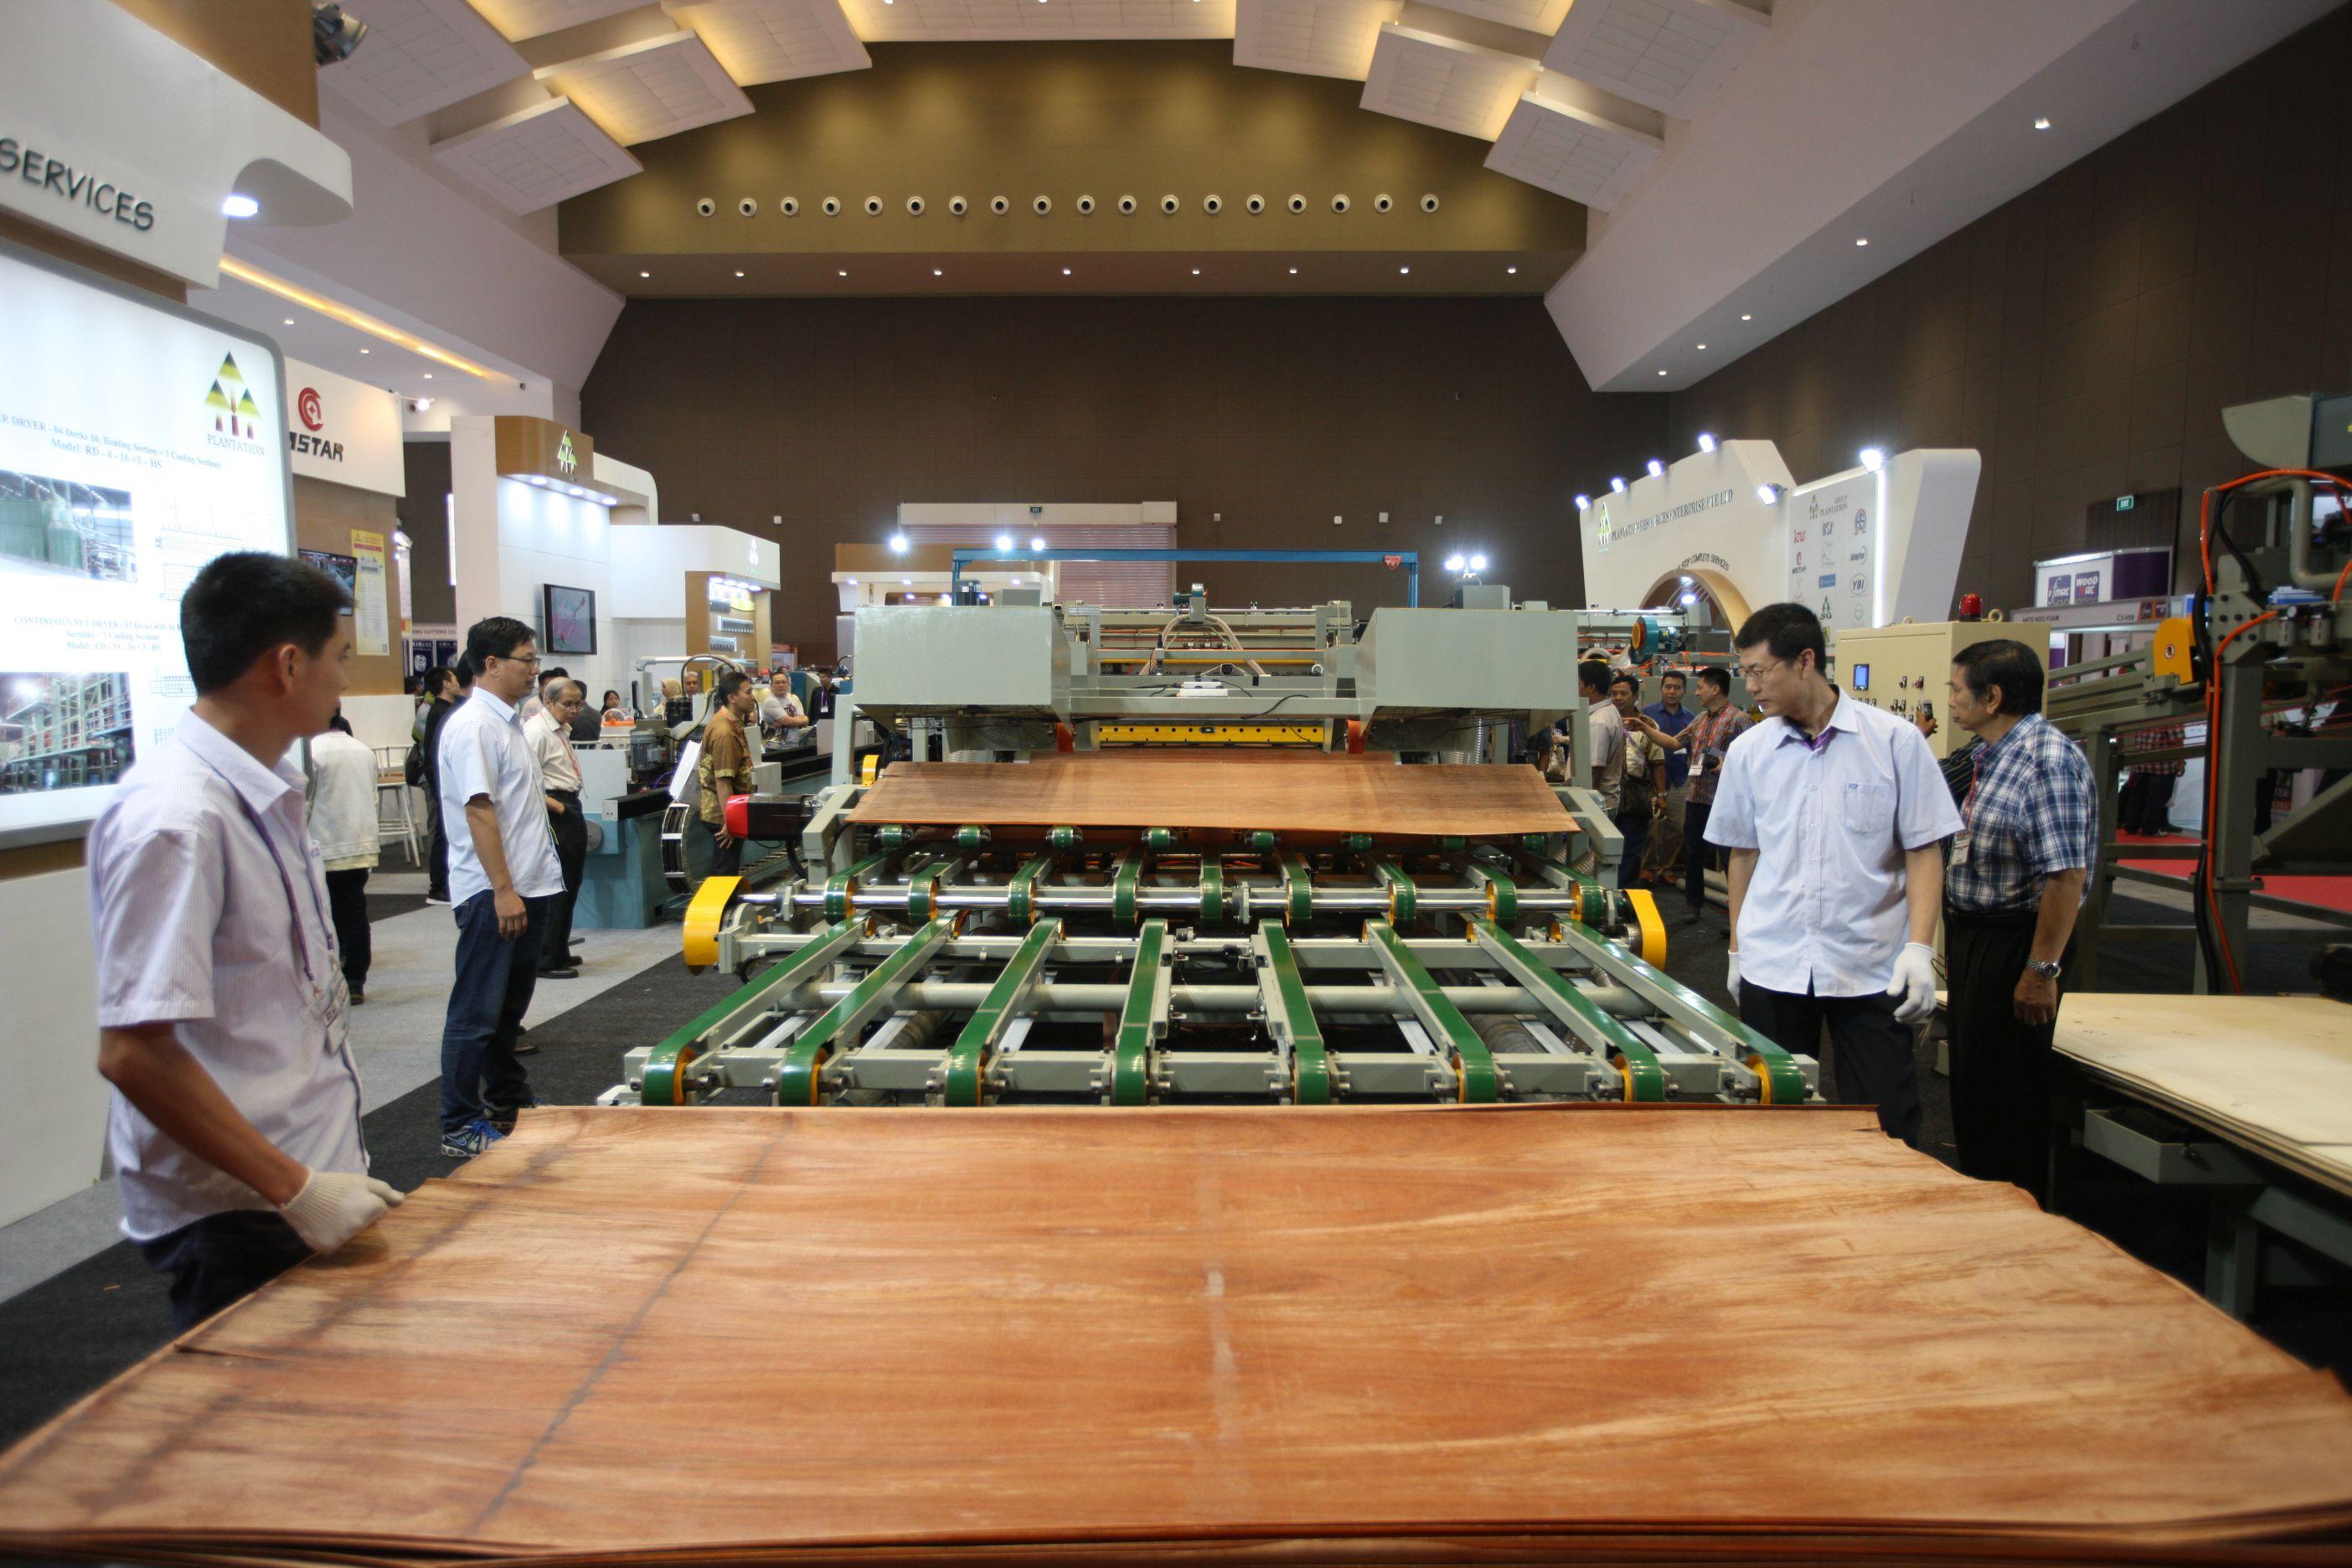 Ifmac 2019 The International Furniture Manufacturing Component